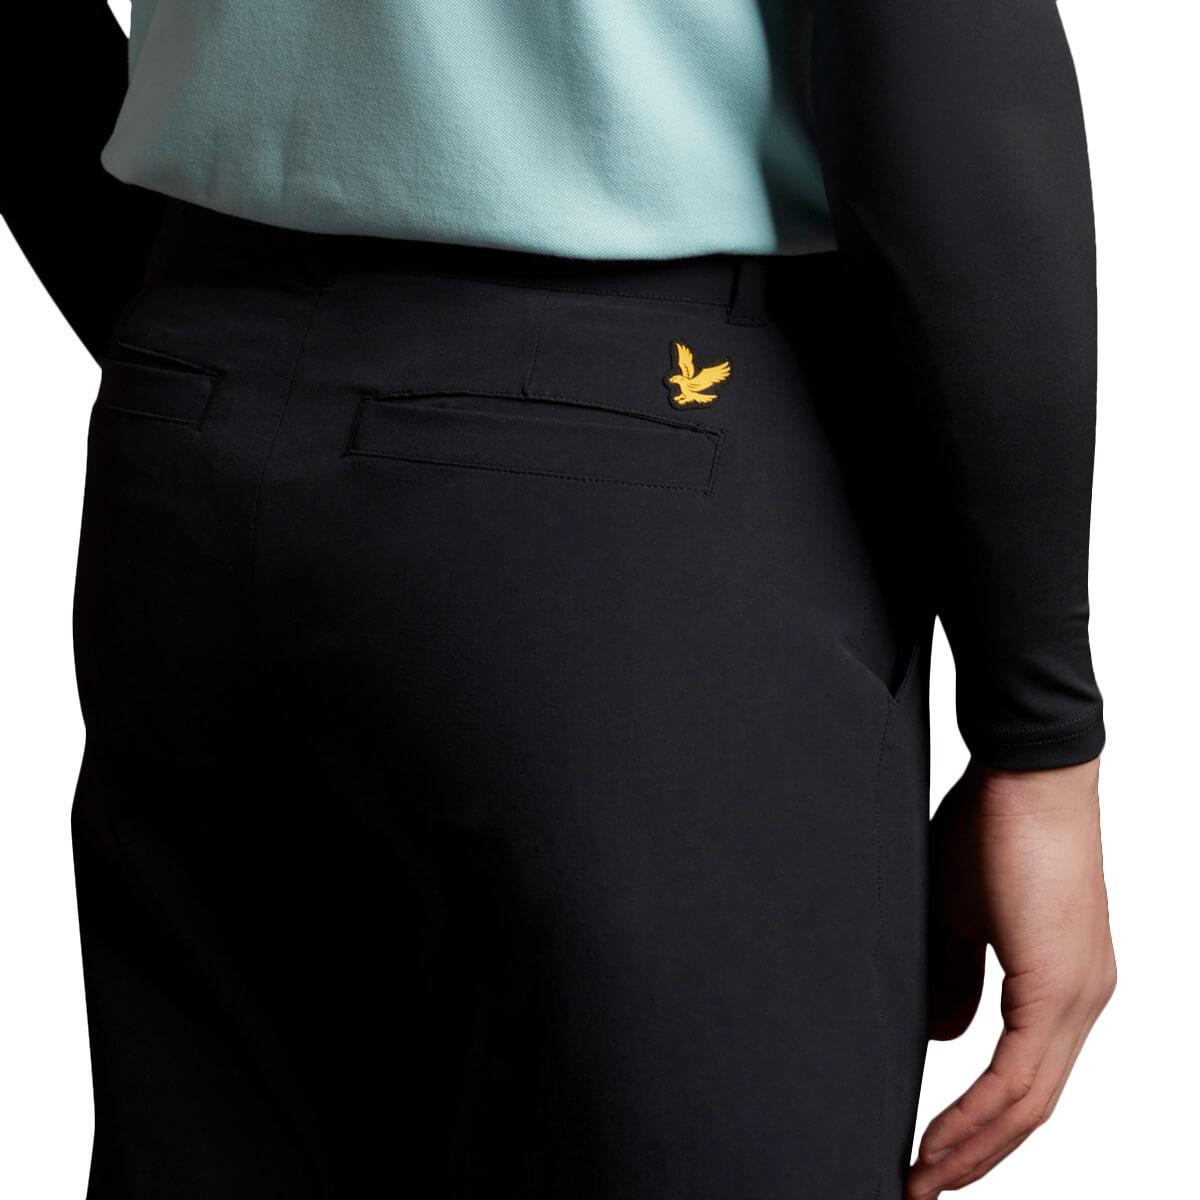 thumbnail 12 - Lyle & Scott Mens Golf Tech Light Stretch Breathable Trousers 55% OFF RRP